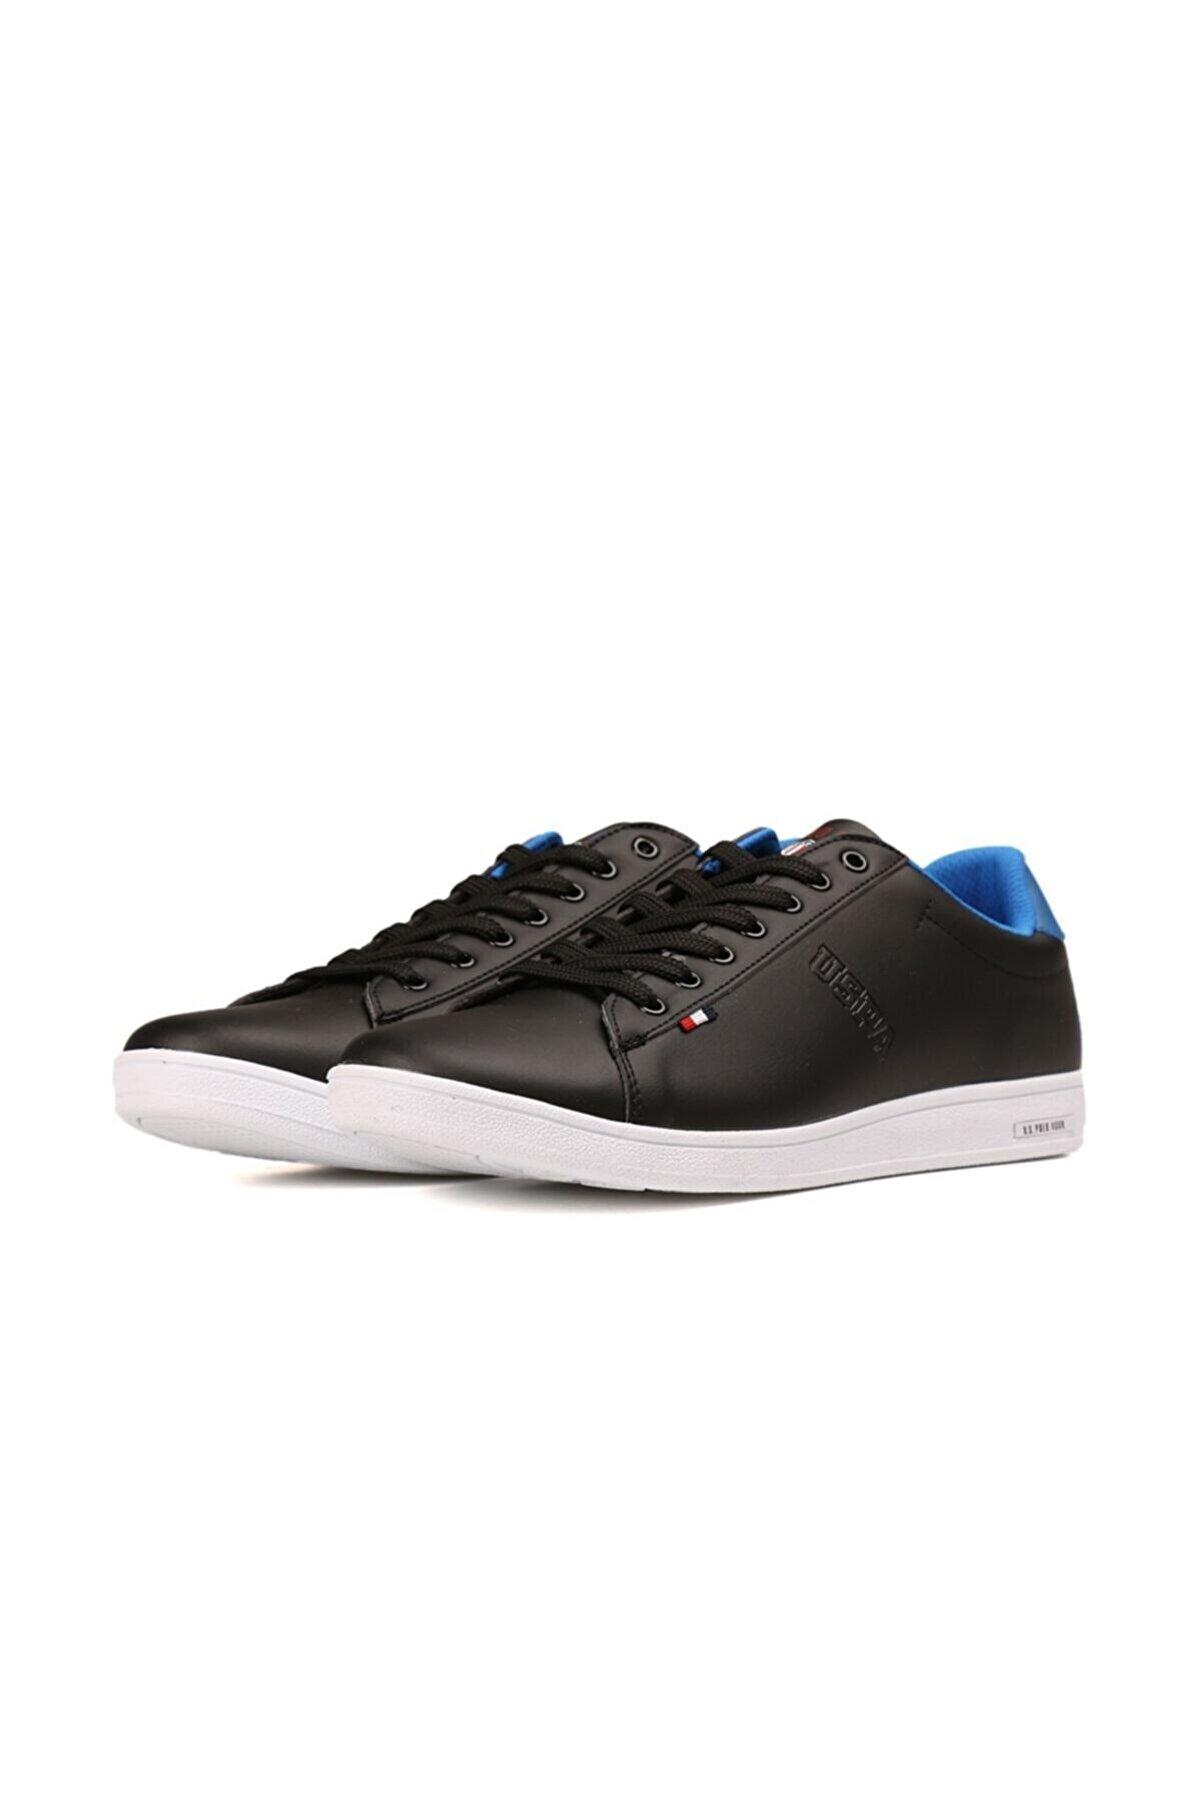 US Polo Assn Erkek SiyahFranco 1fx Mavi Sneaker 100910272